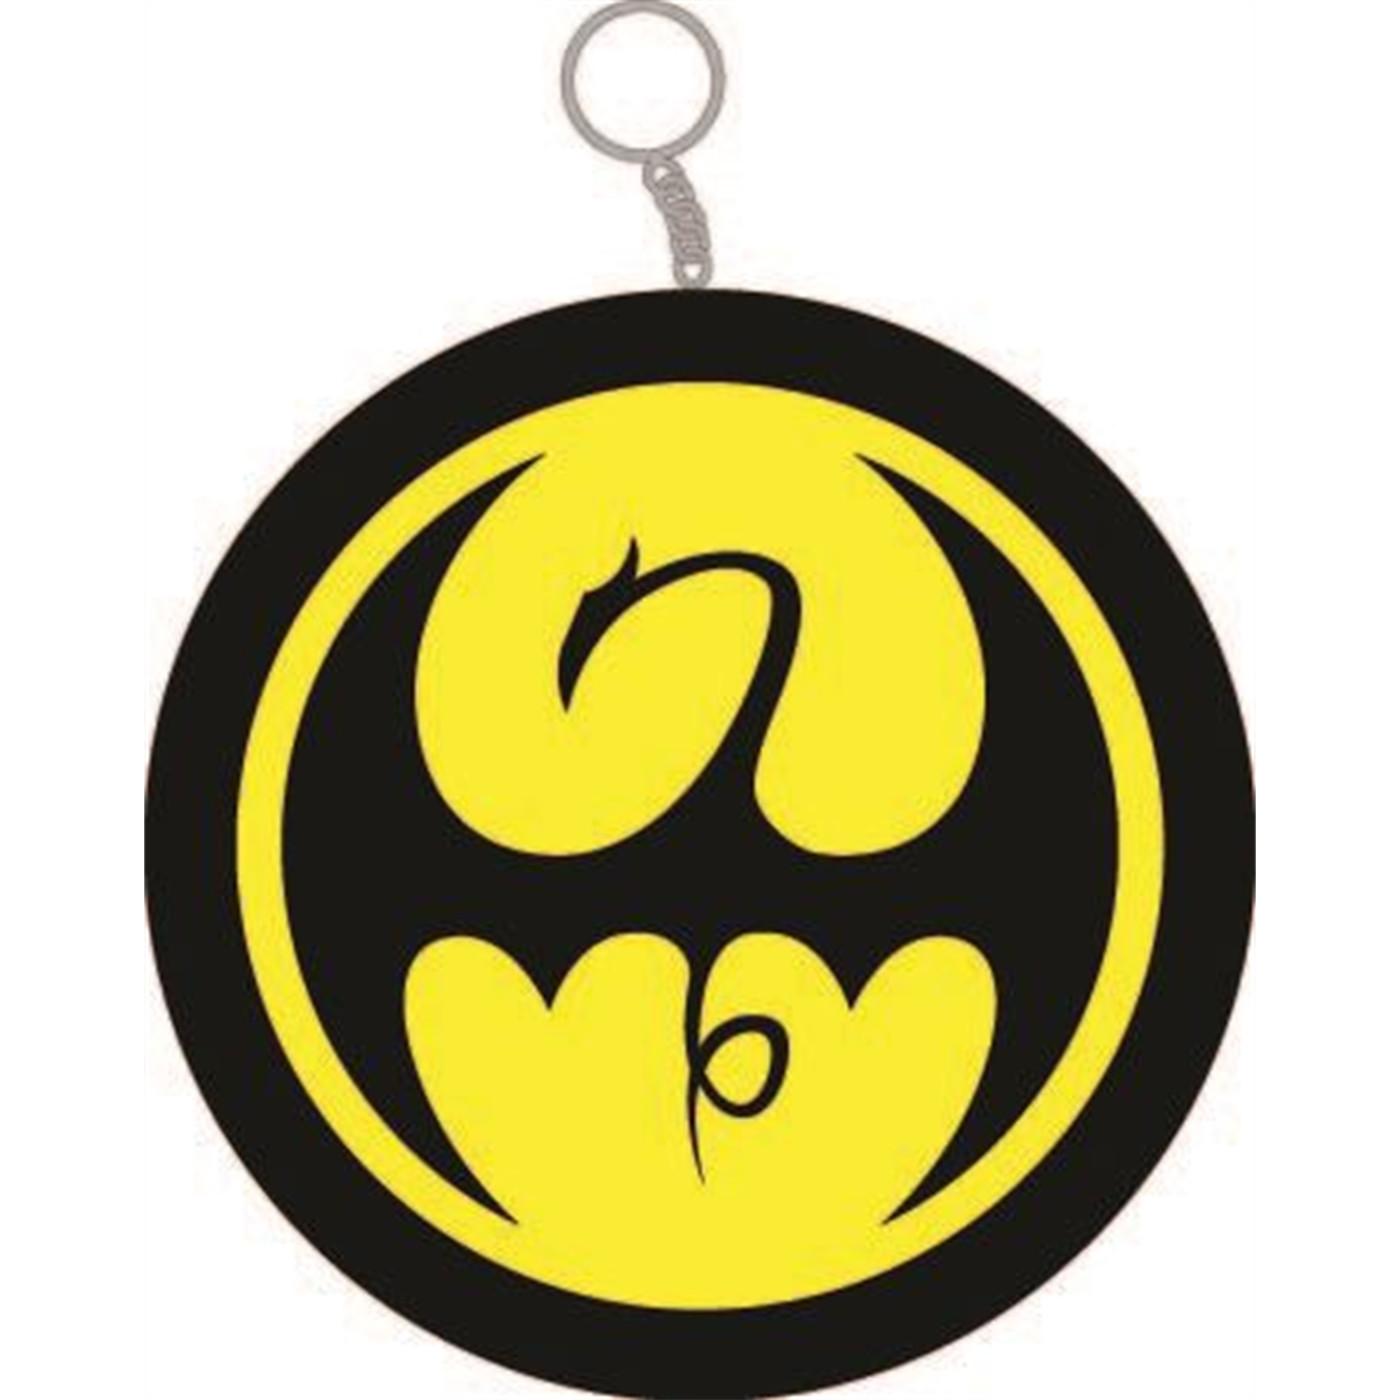 Iron Fist Symbol Keychain